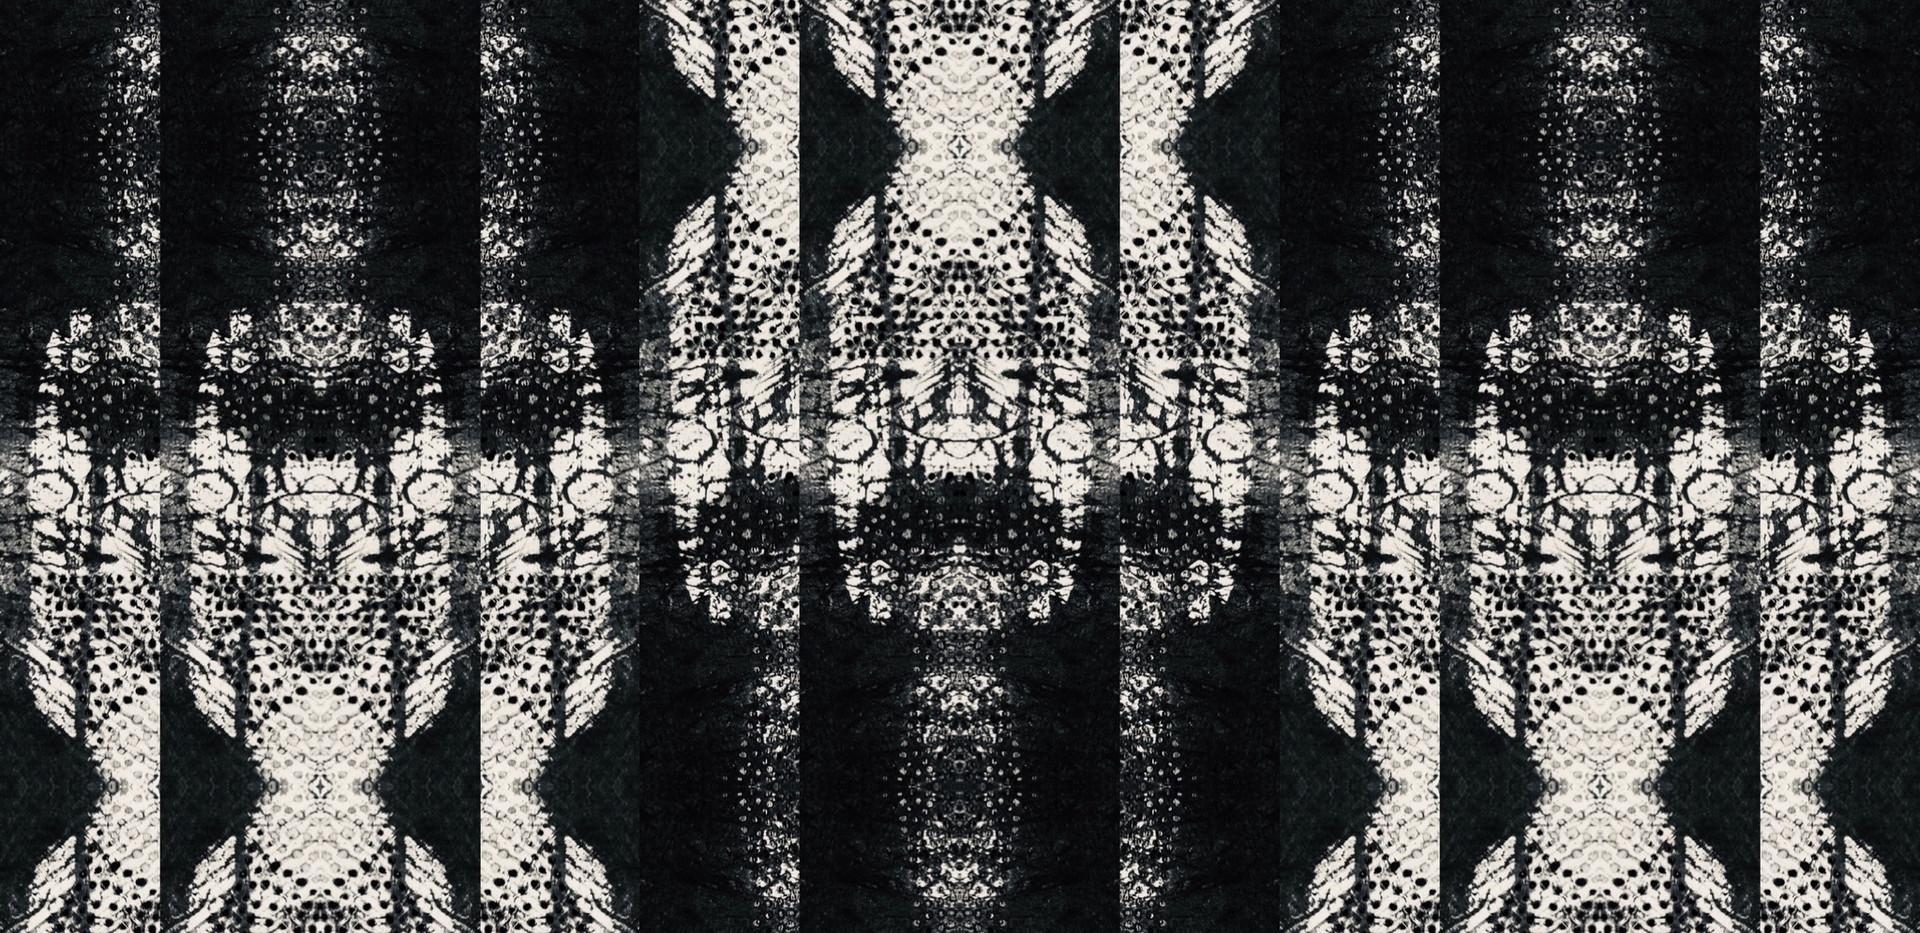 Dark Matter 4